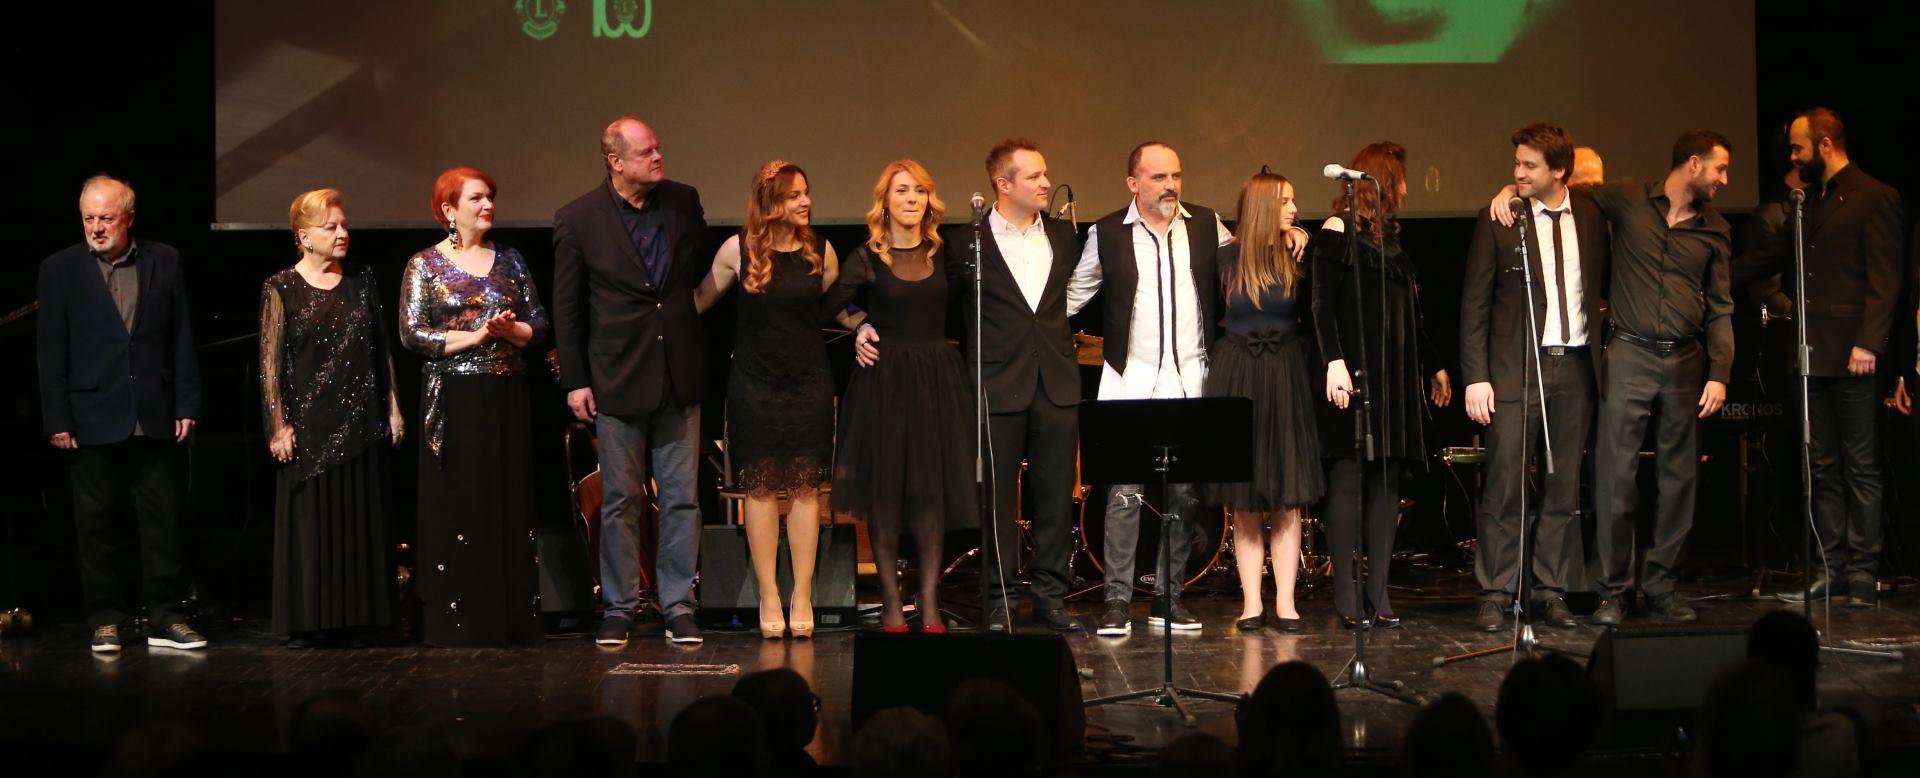 FOTO: Uz pregršt emocija održan humanitarni koncert u spomen na Helgu Vlahović Brnobić